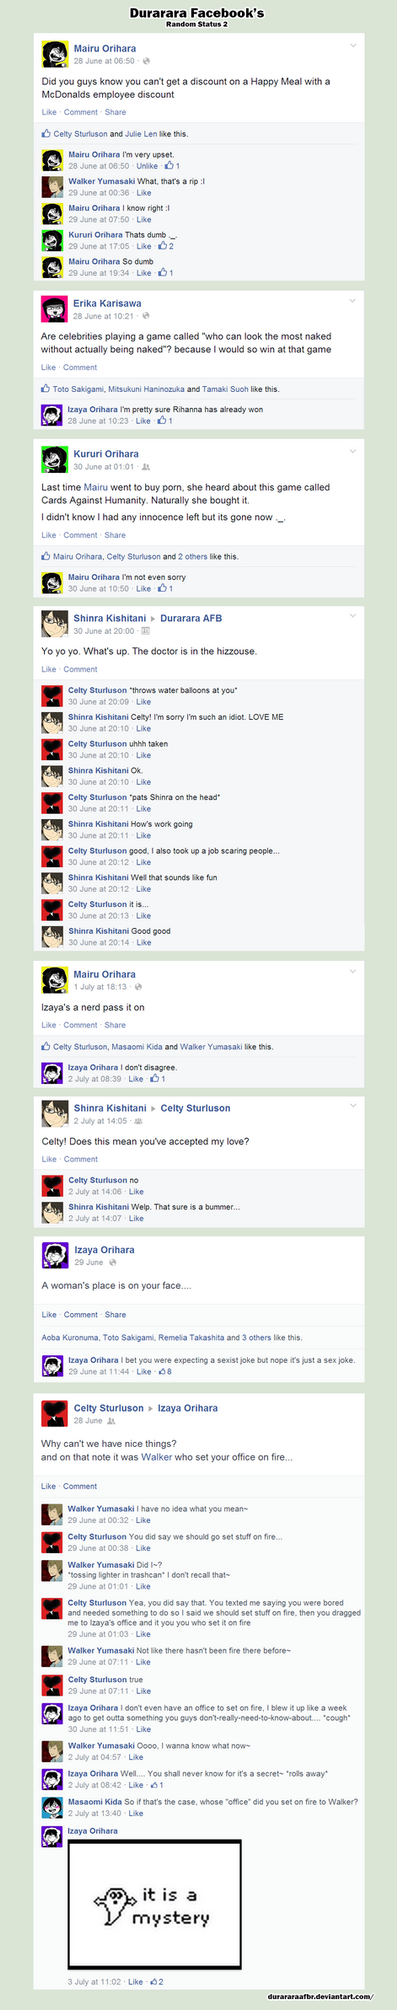 DURRR FB: Random Status [2] by pwinsesducky